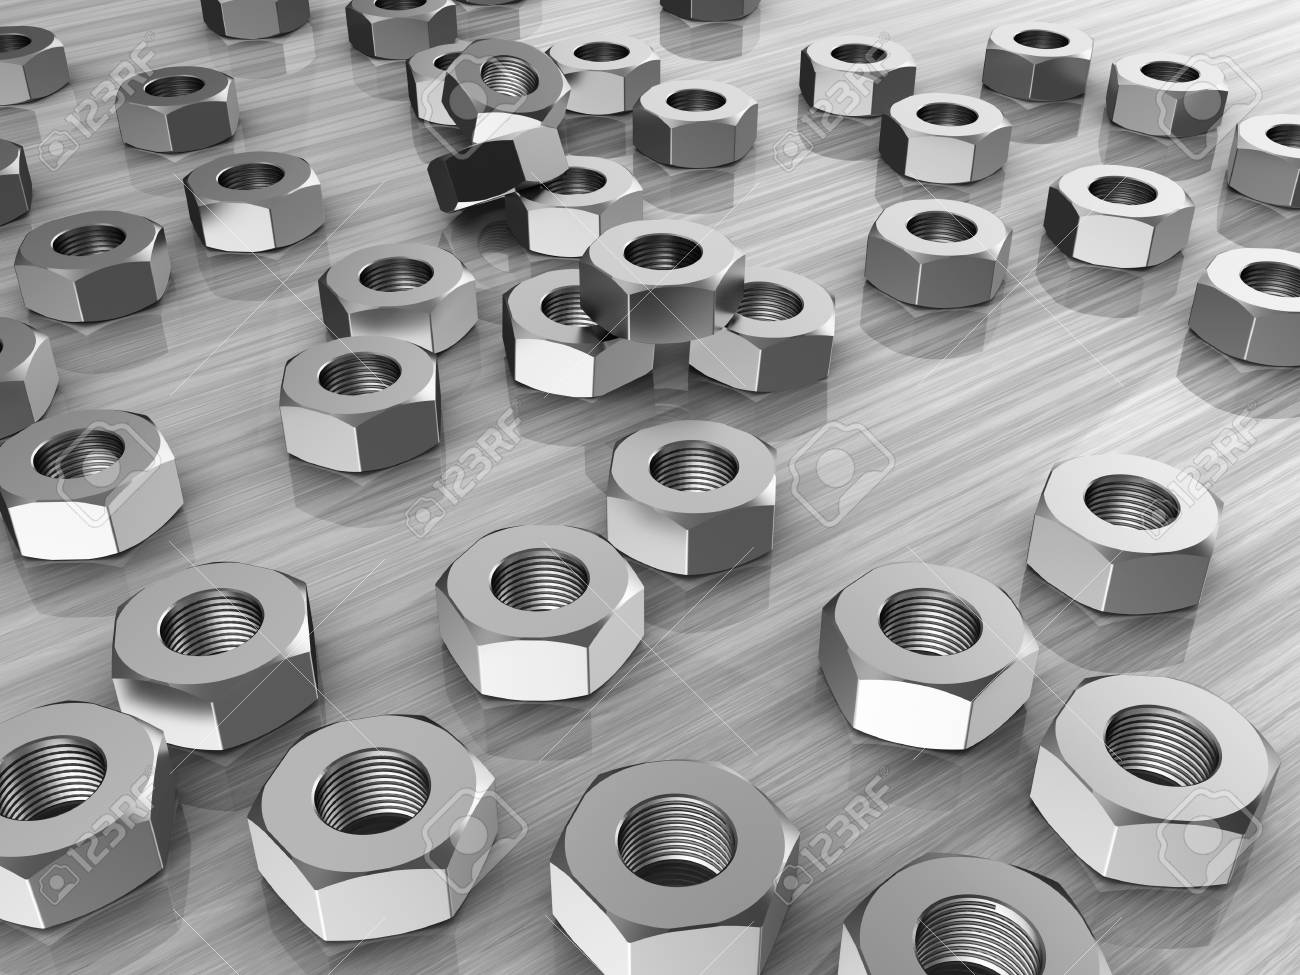 Metallic several screws over grey background Stock Photo - 15209575